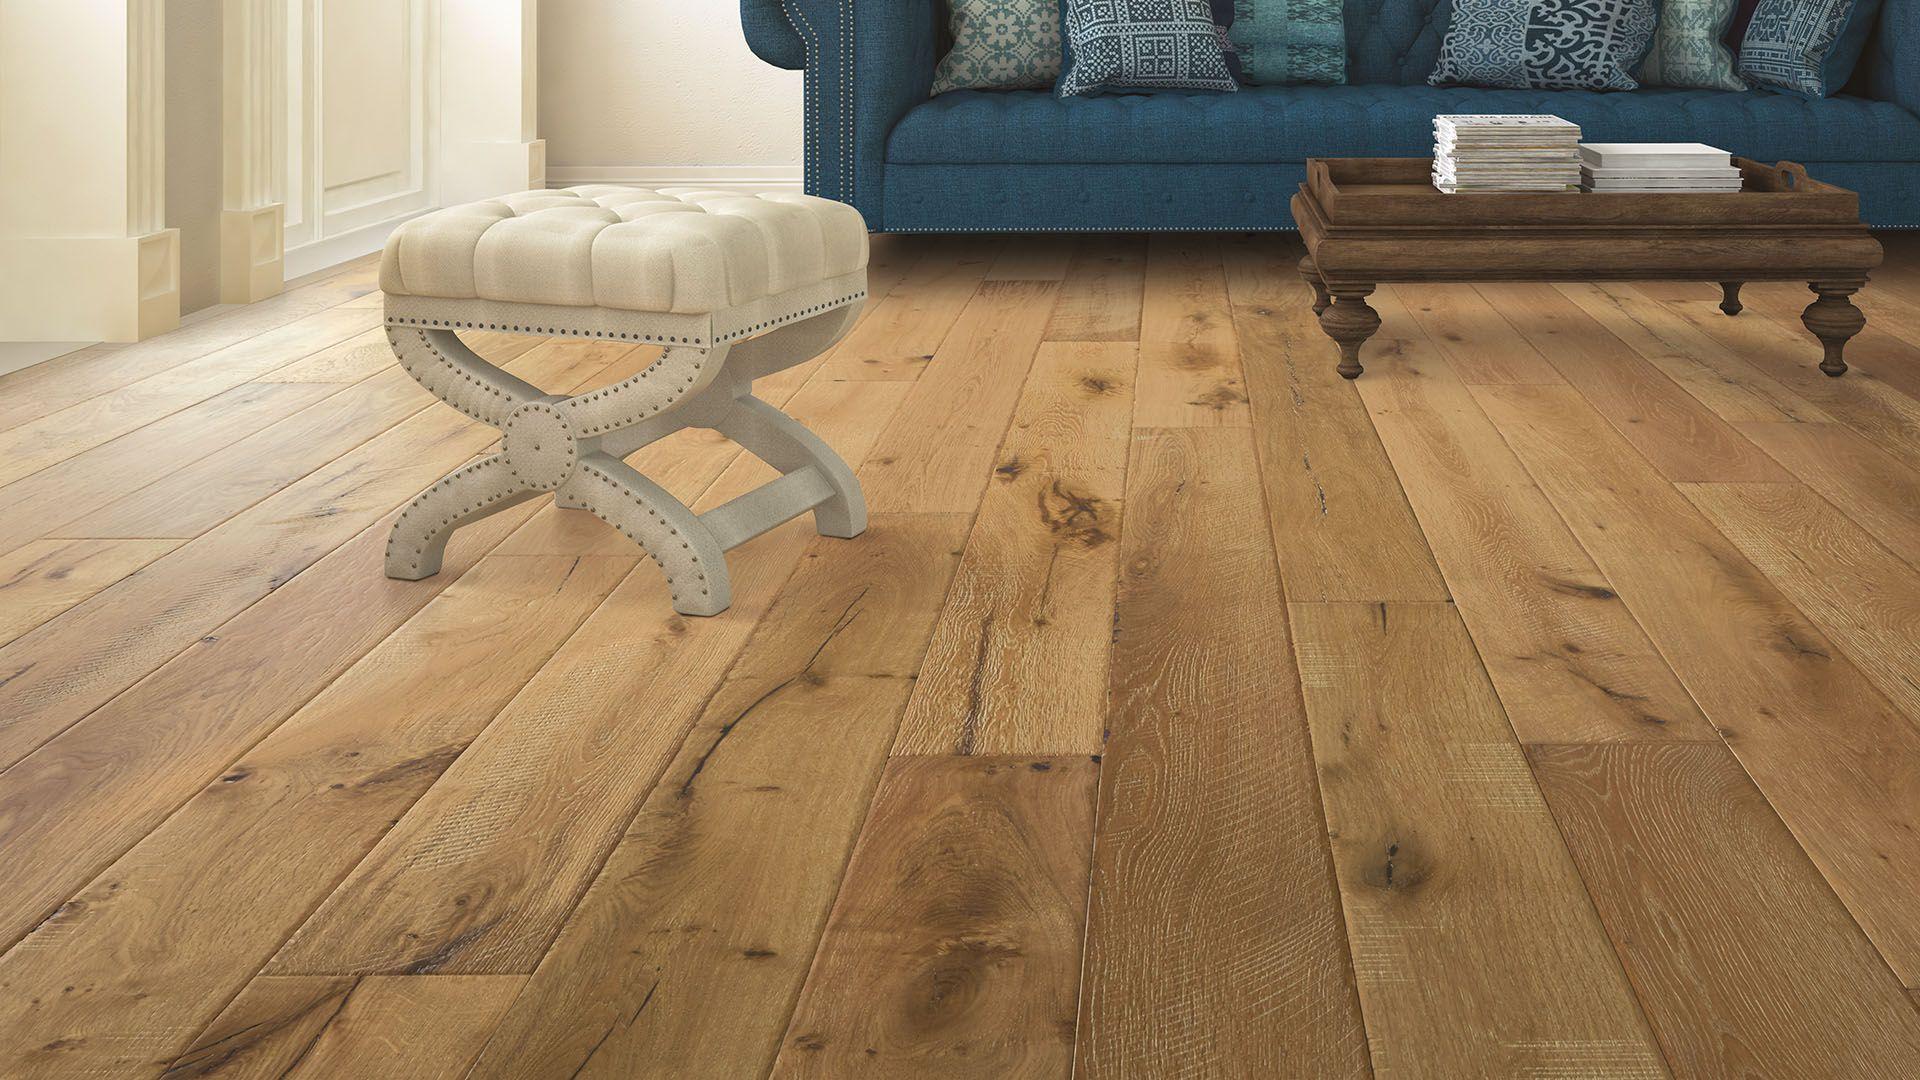 American Relics Cedar Point Flooring Wood Floors New Homes